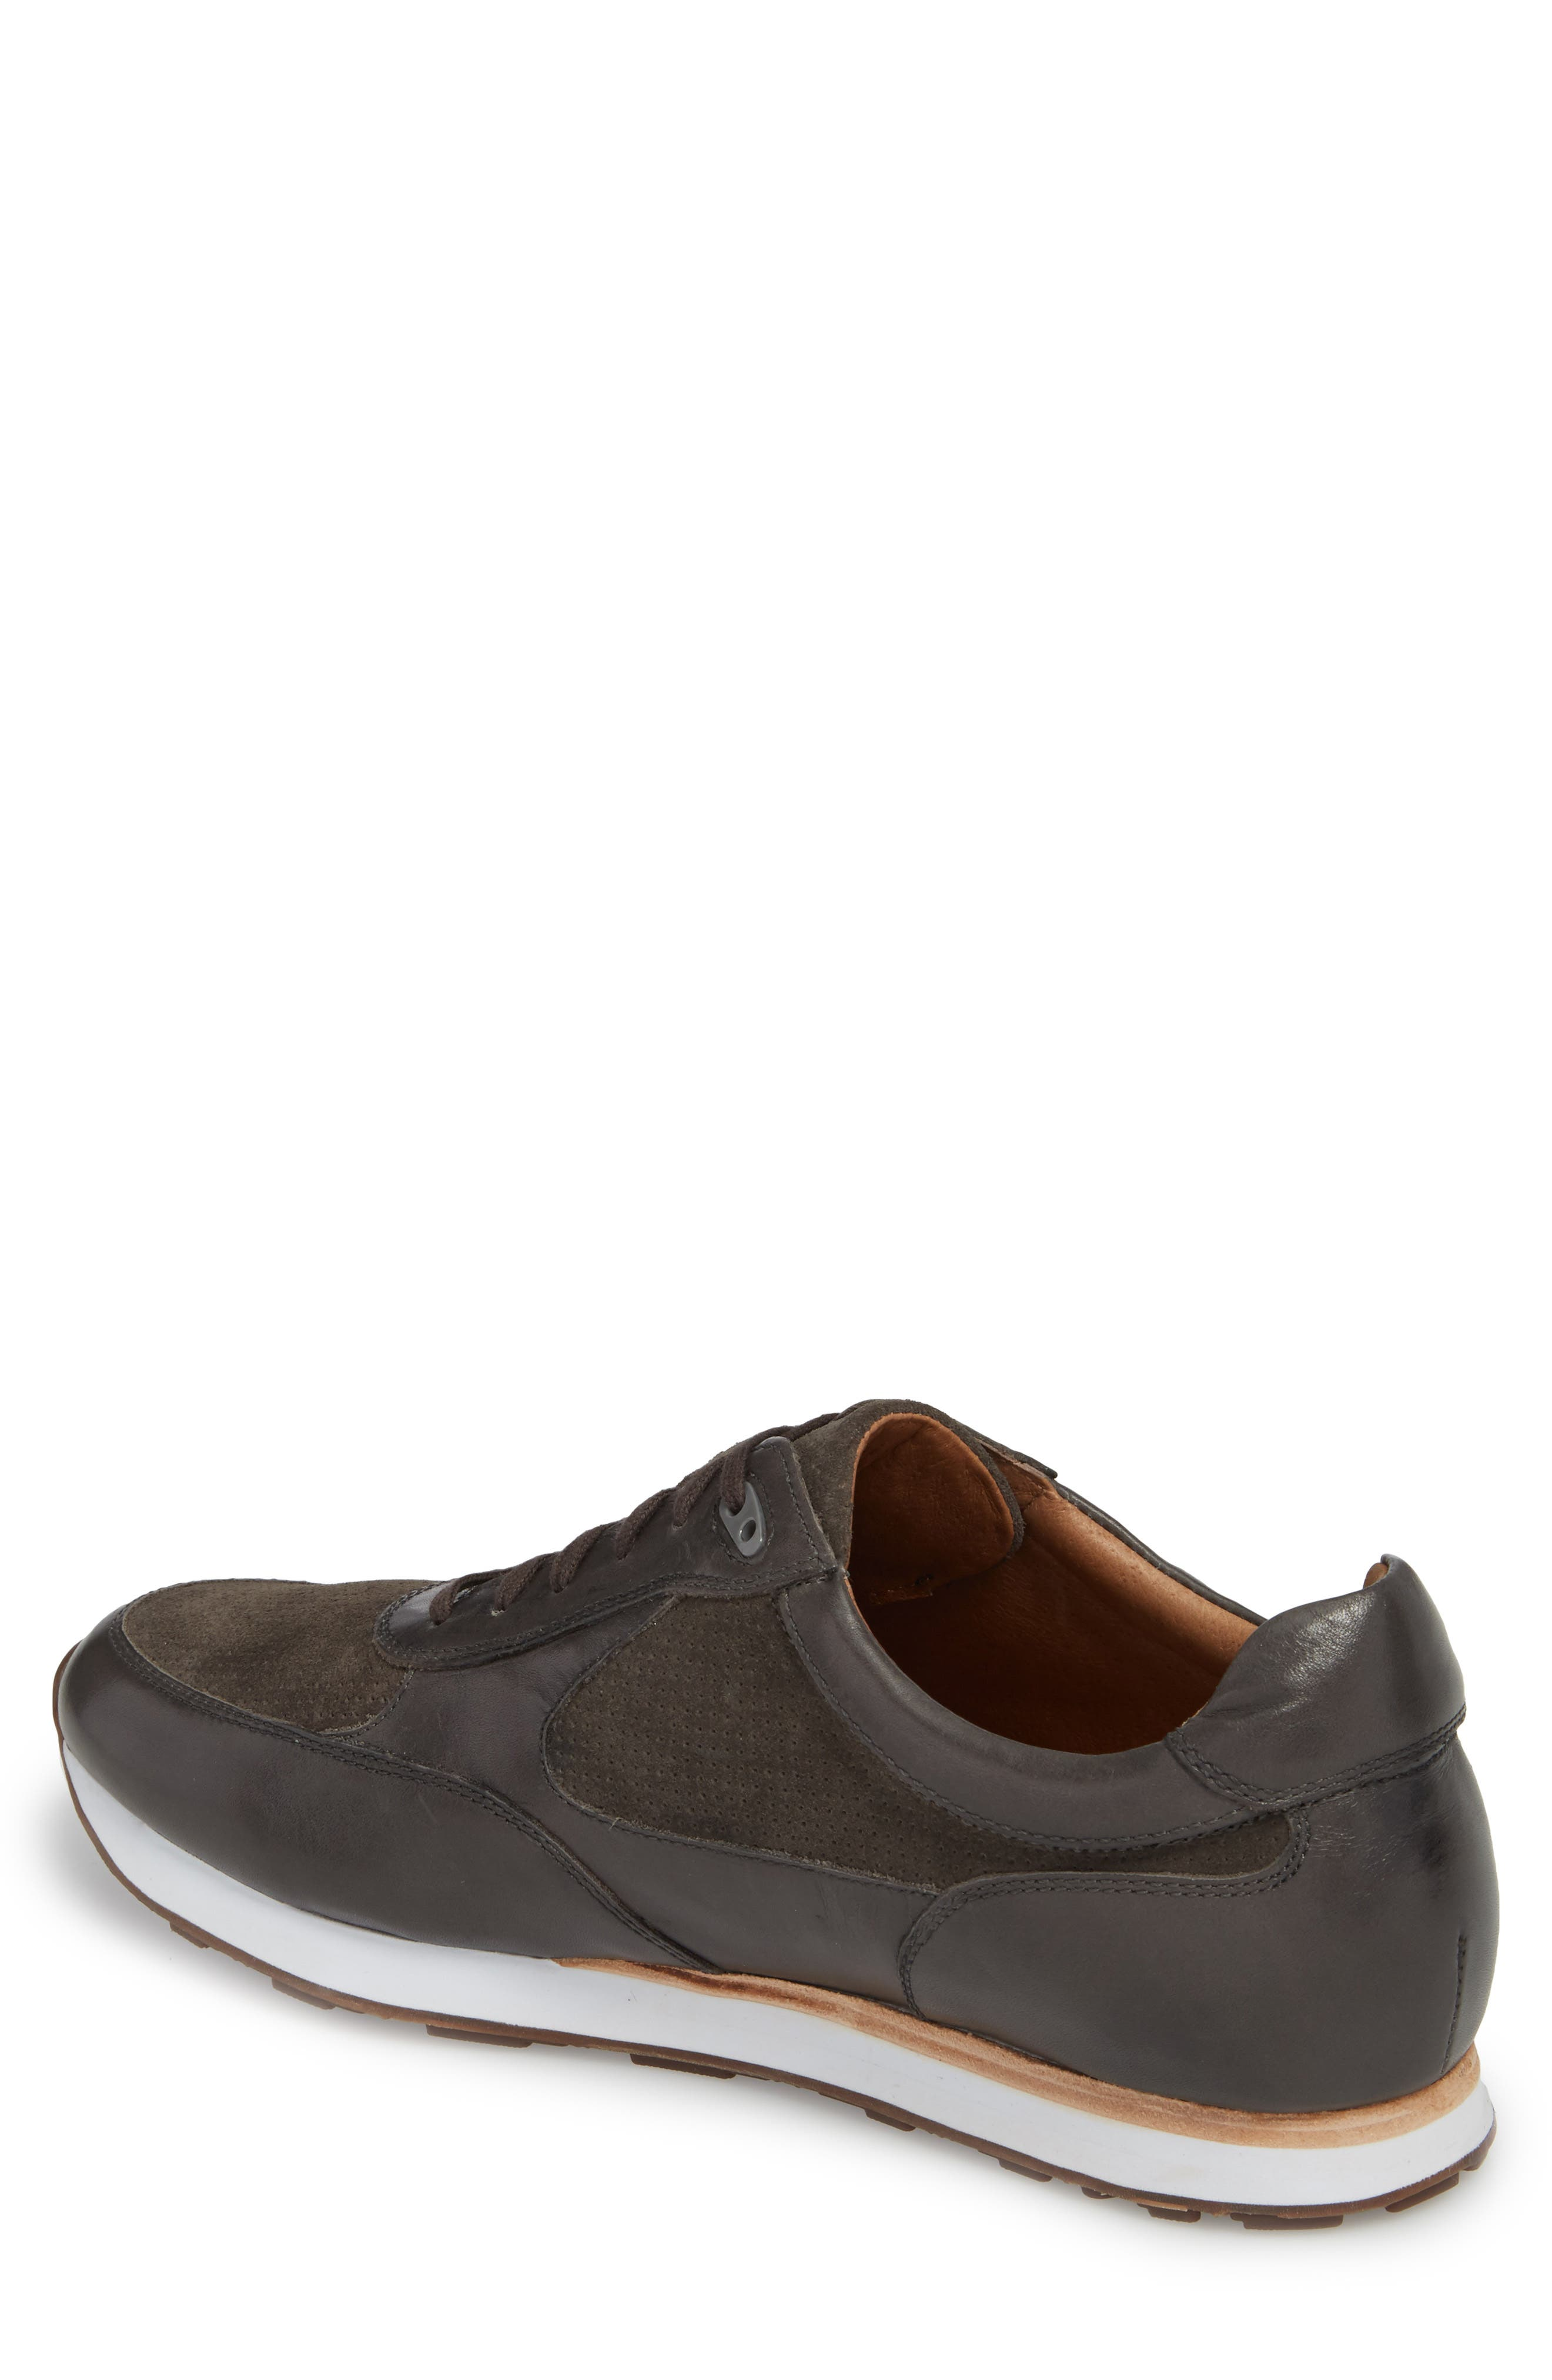 Malek Low Top Sneaker,                             Alternate thumbnail 2, color,                             020